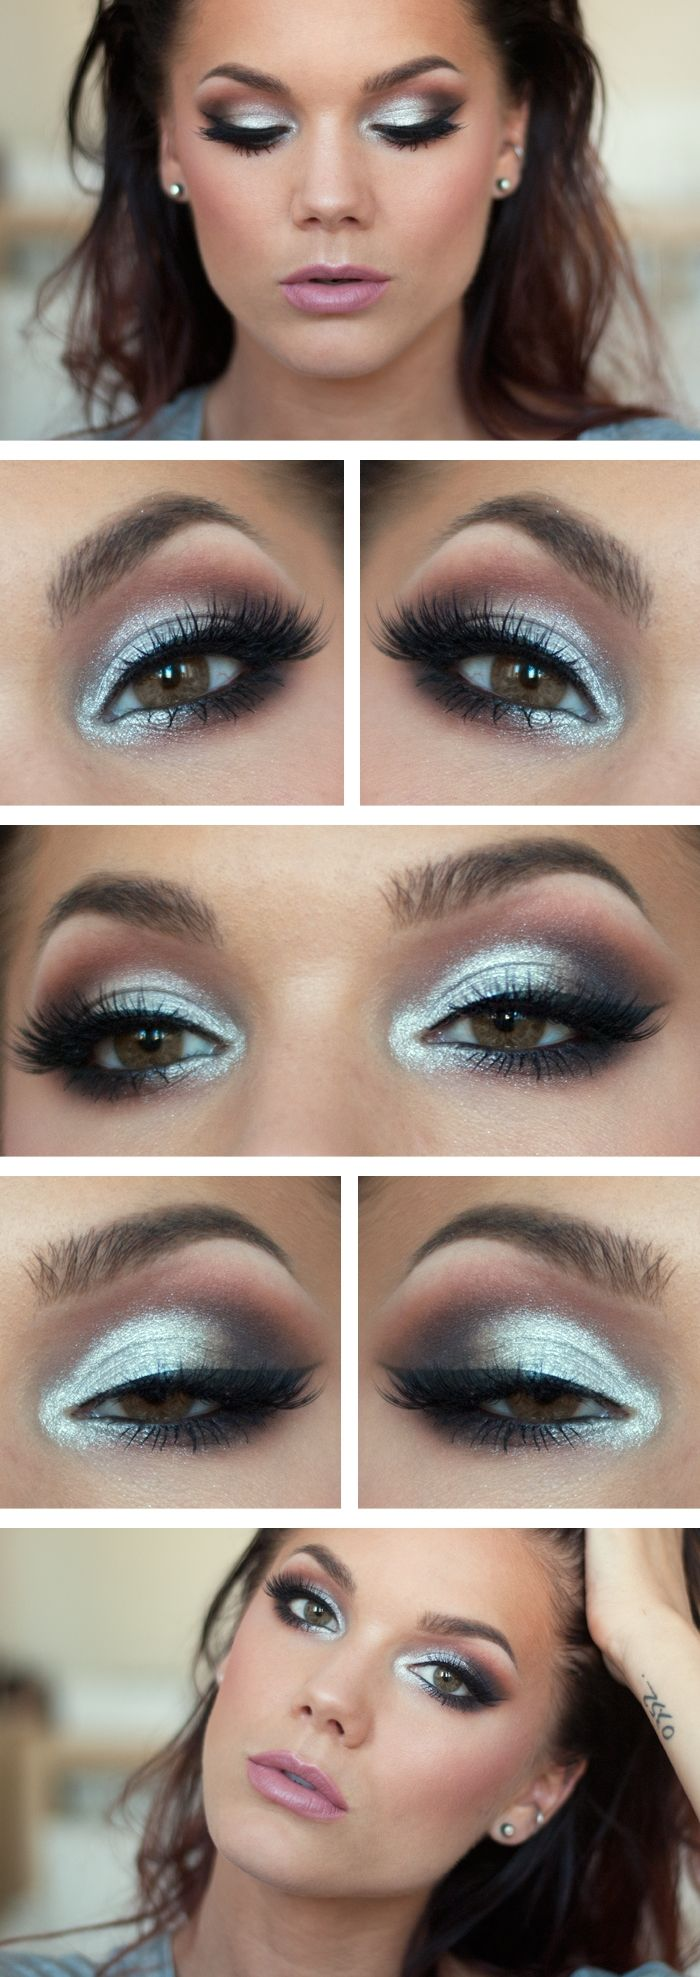 White dress eye makeup - Birthday Make Up